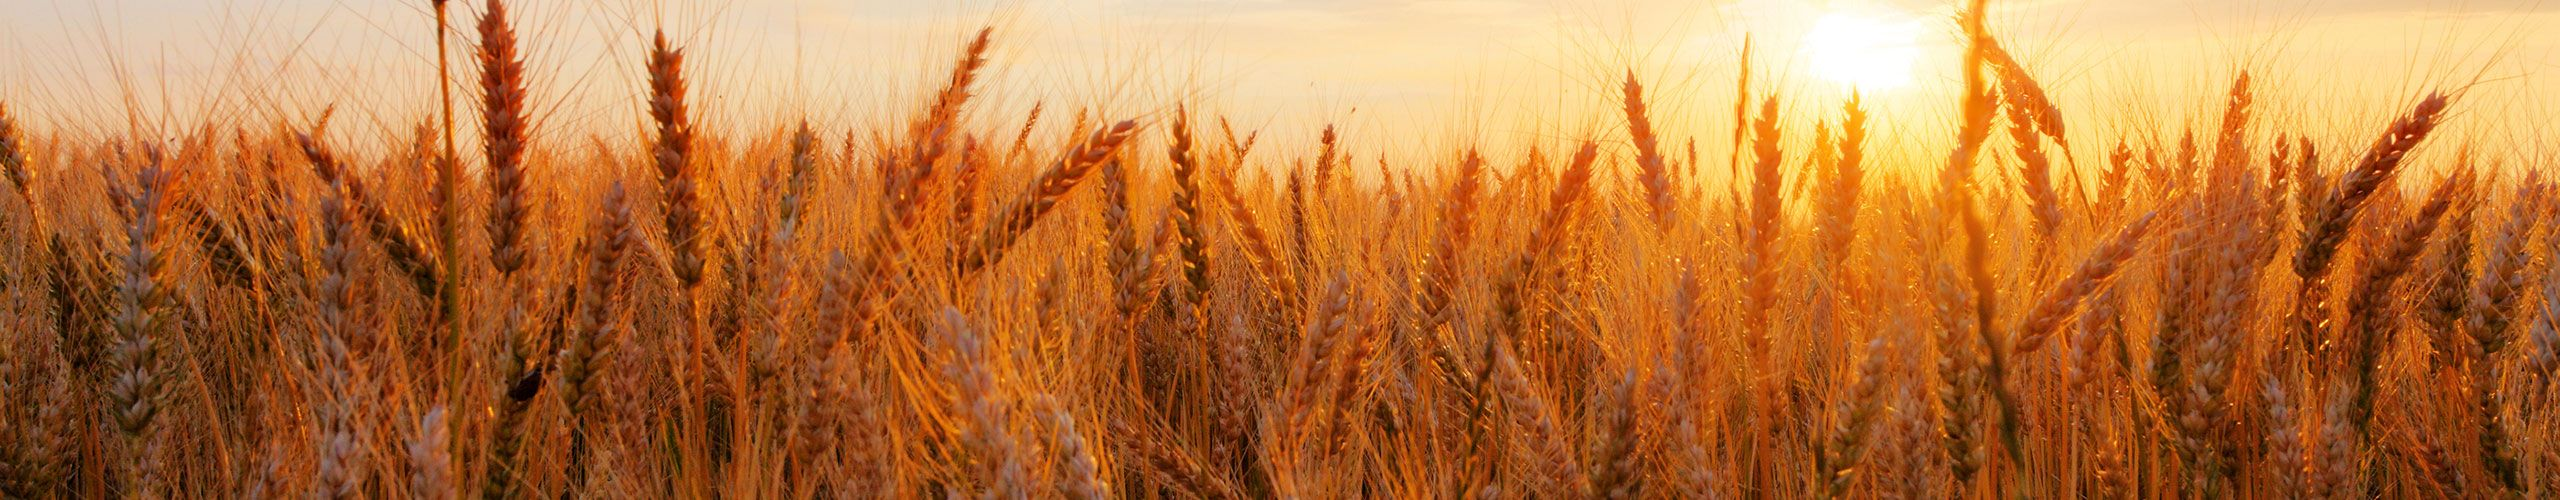 bigstock-Wheat-Field-Over-Sunset-47579836